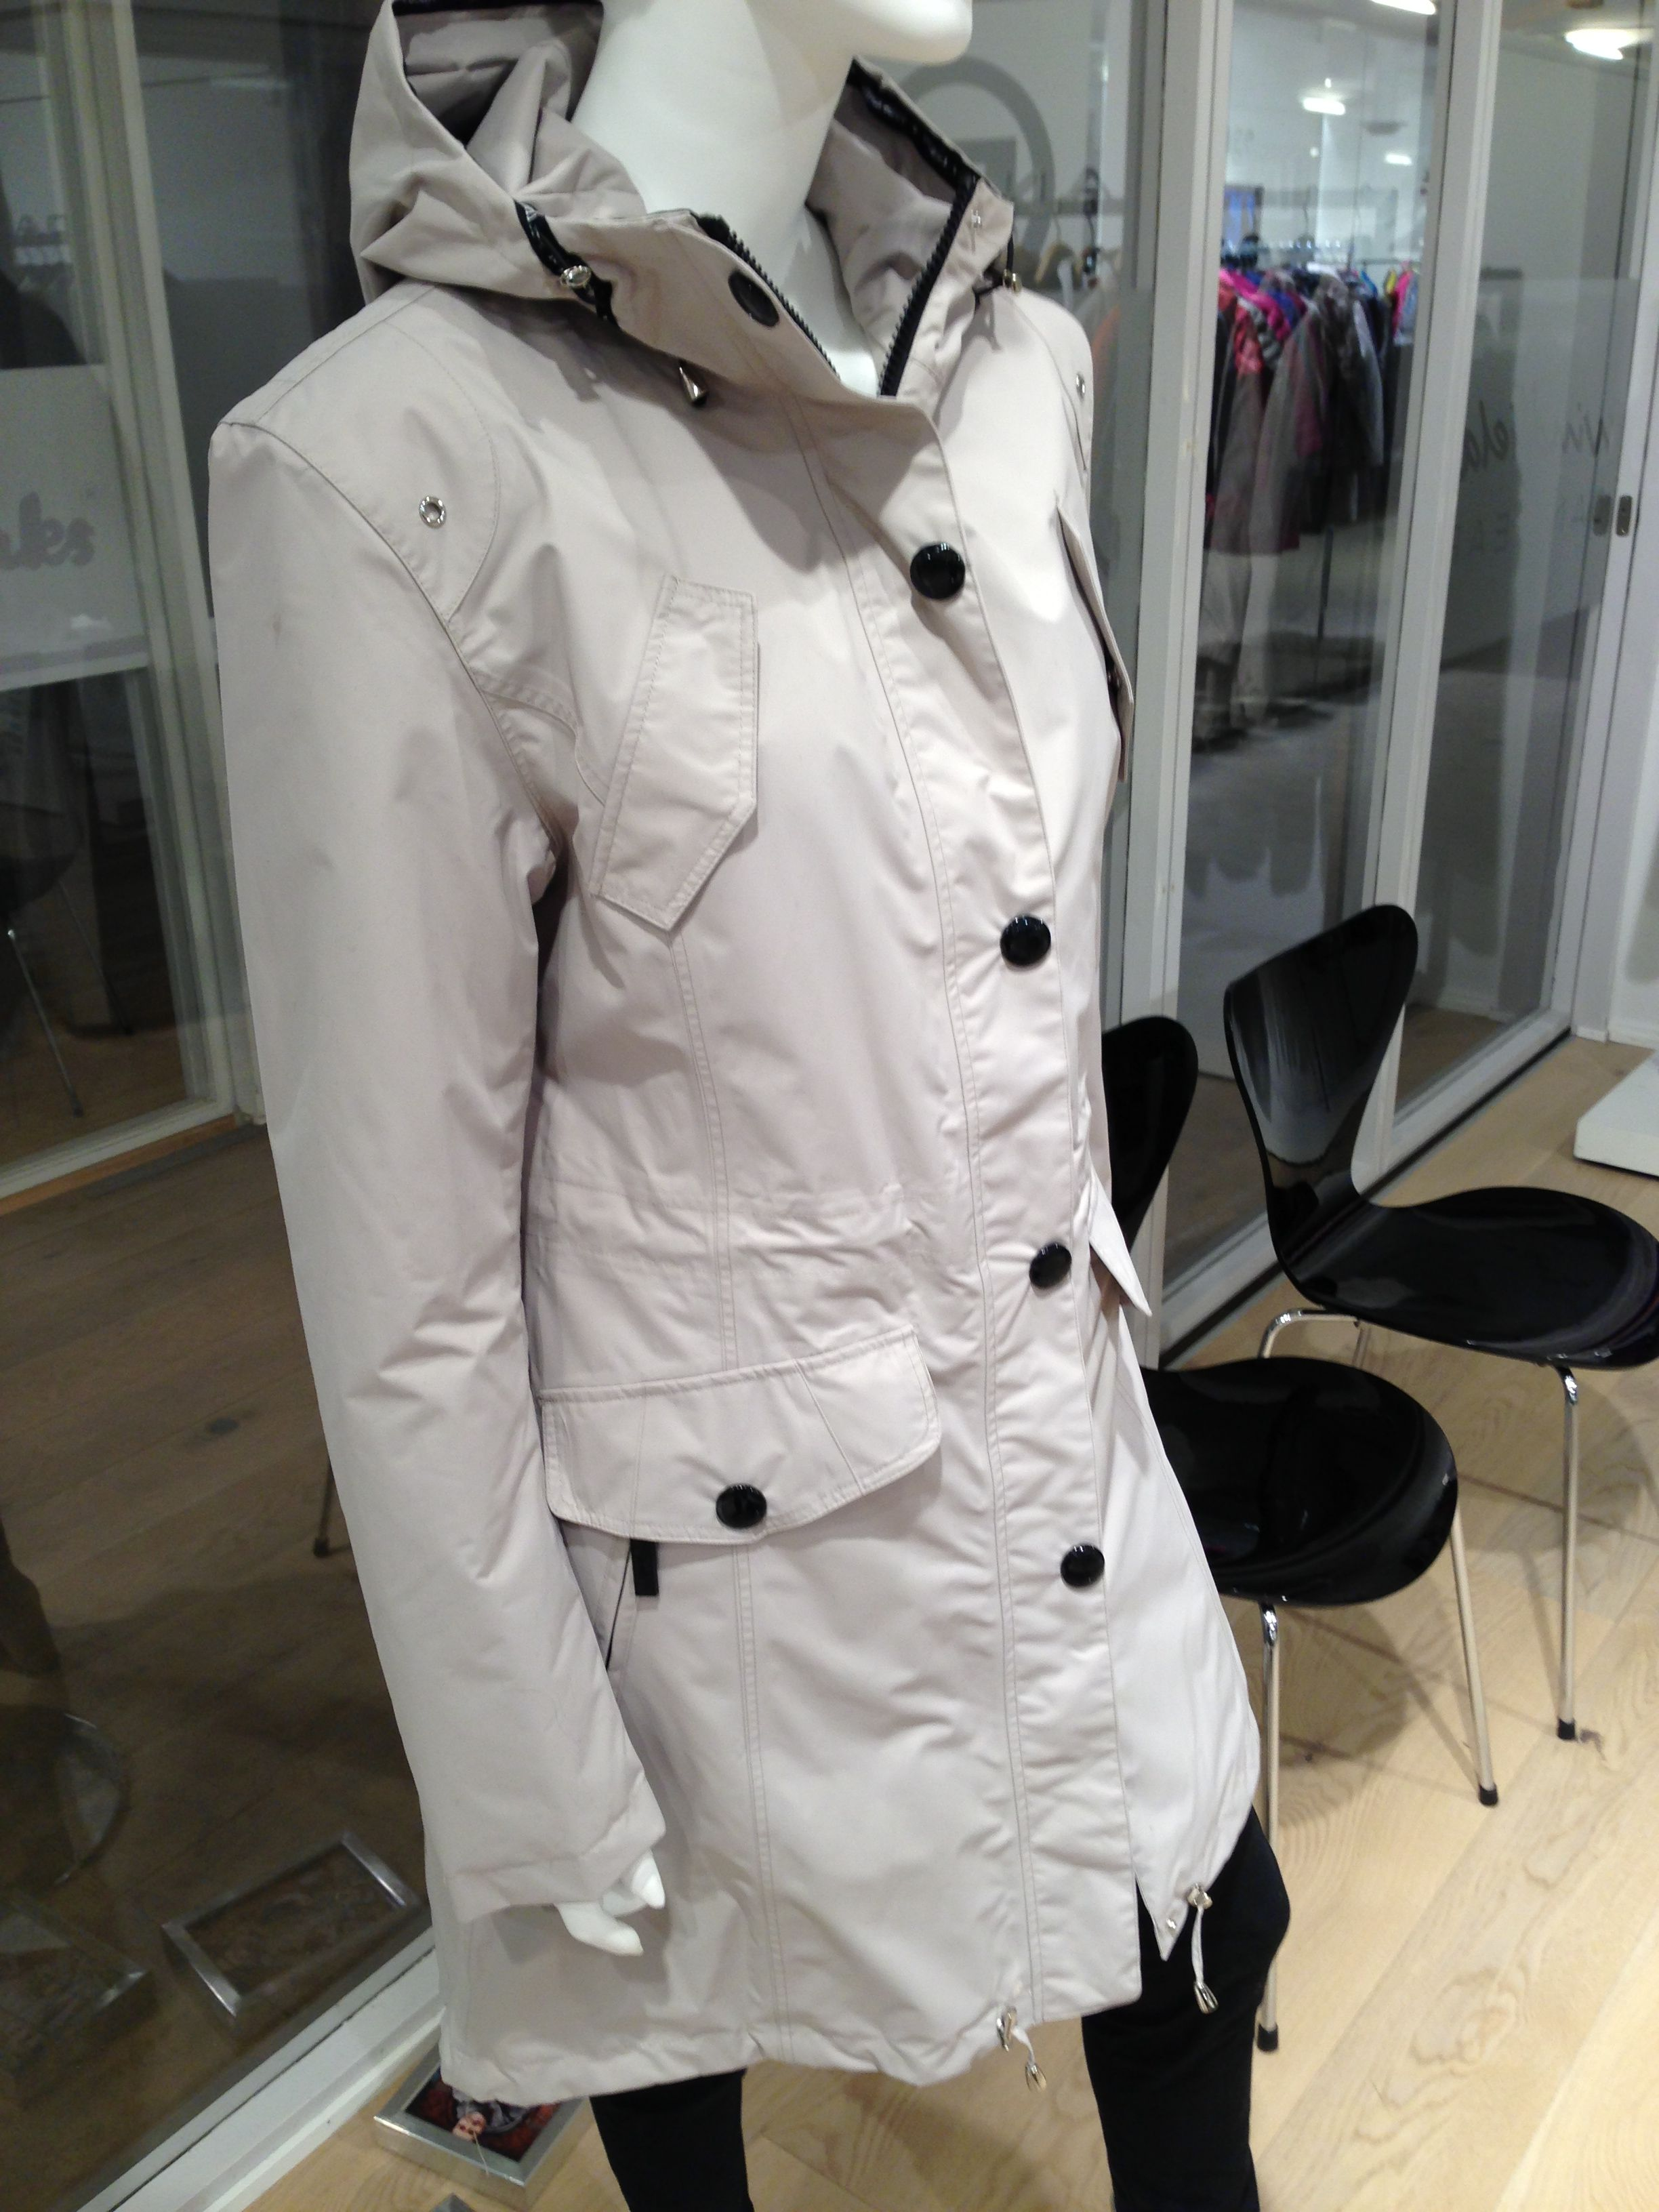 Normann Coat Anne Miller Raincoat Raincoat Coat Jackets